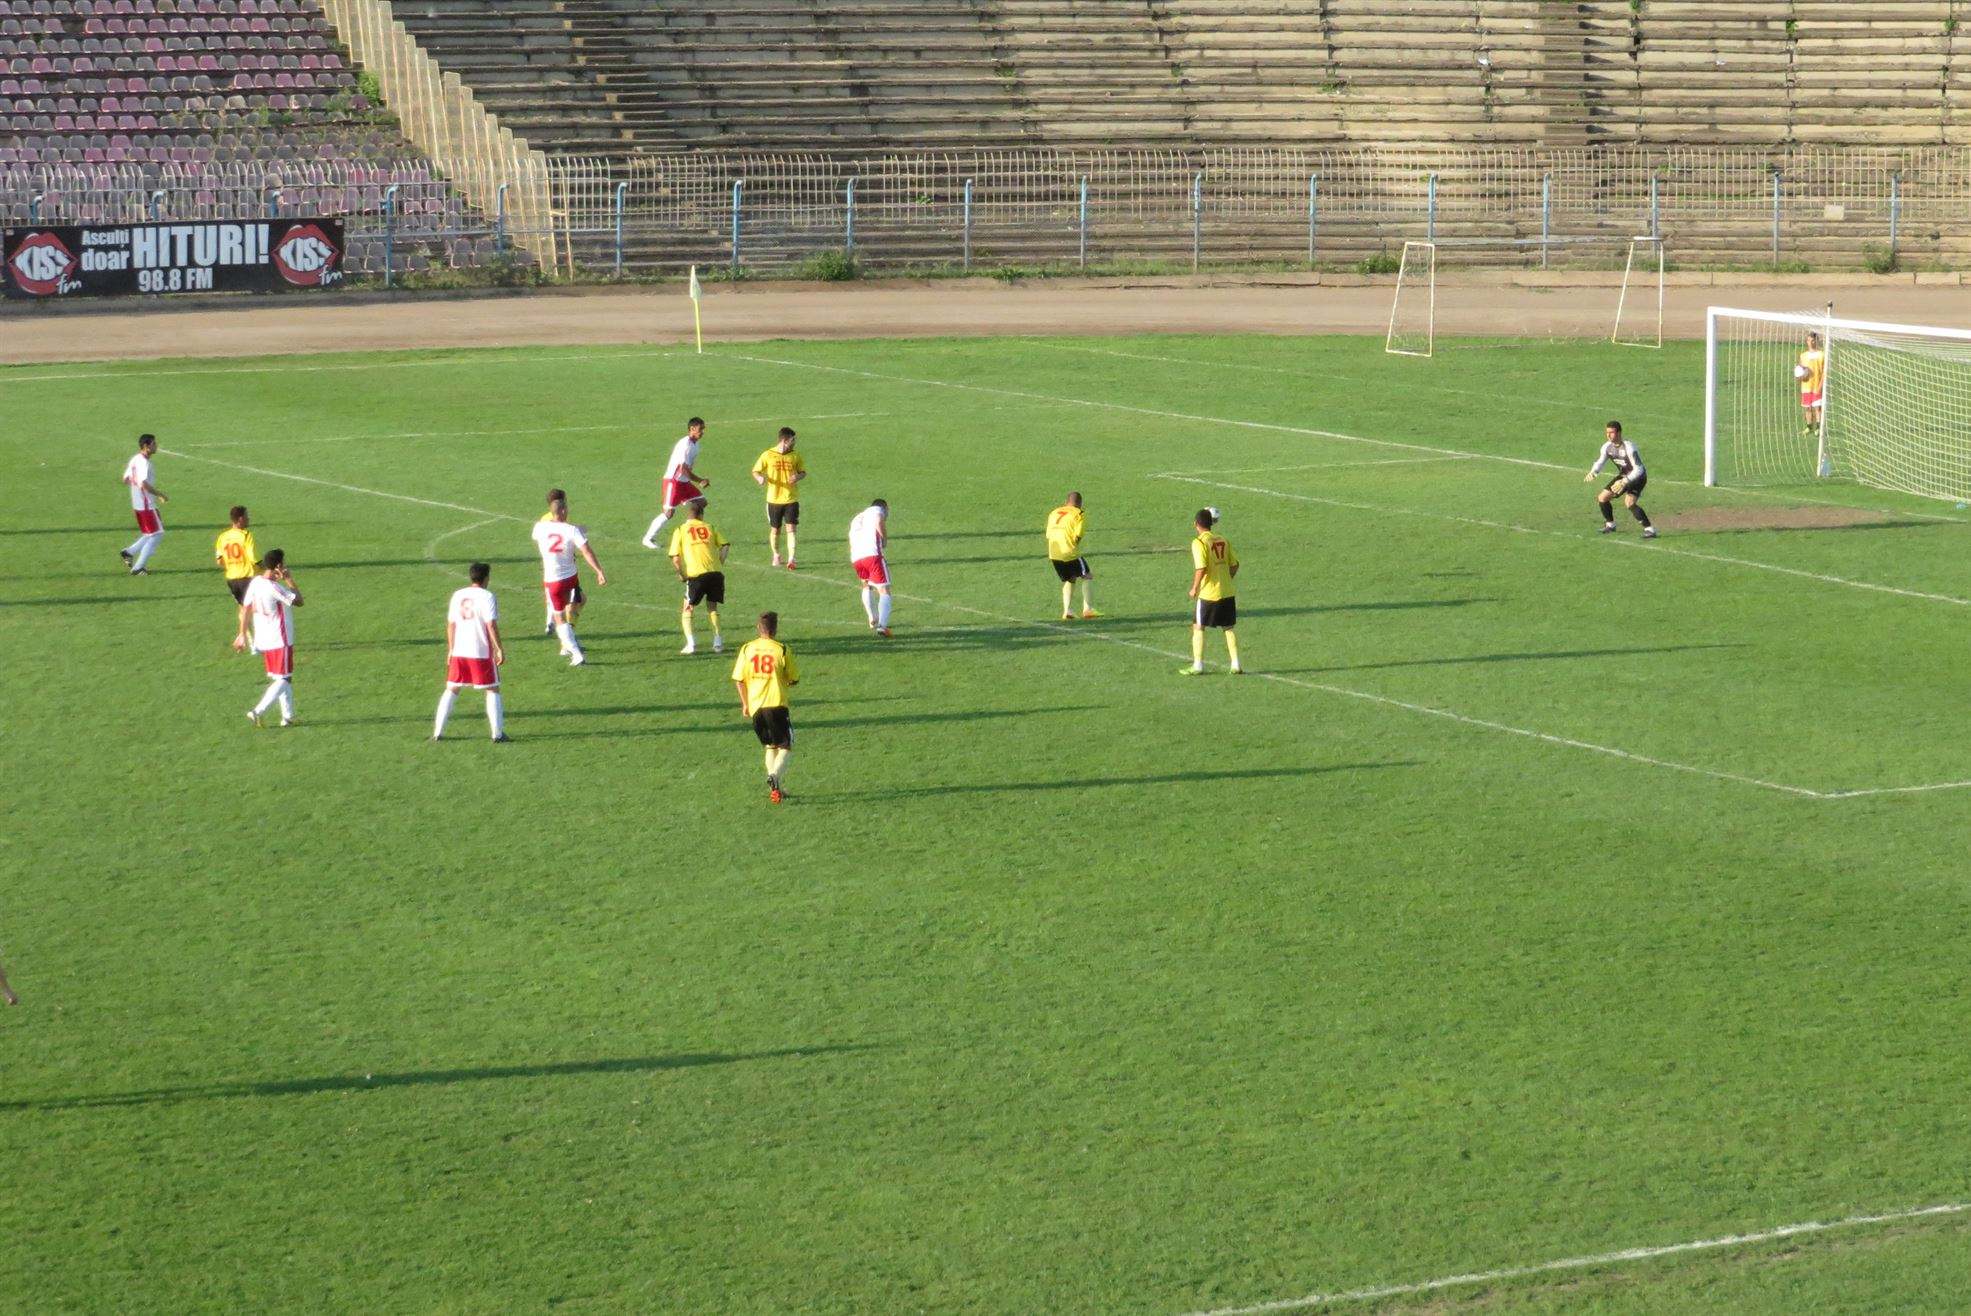 Conpetul a umilit Callatisul, scor 7-0